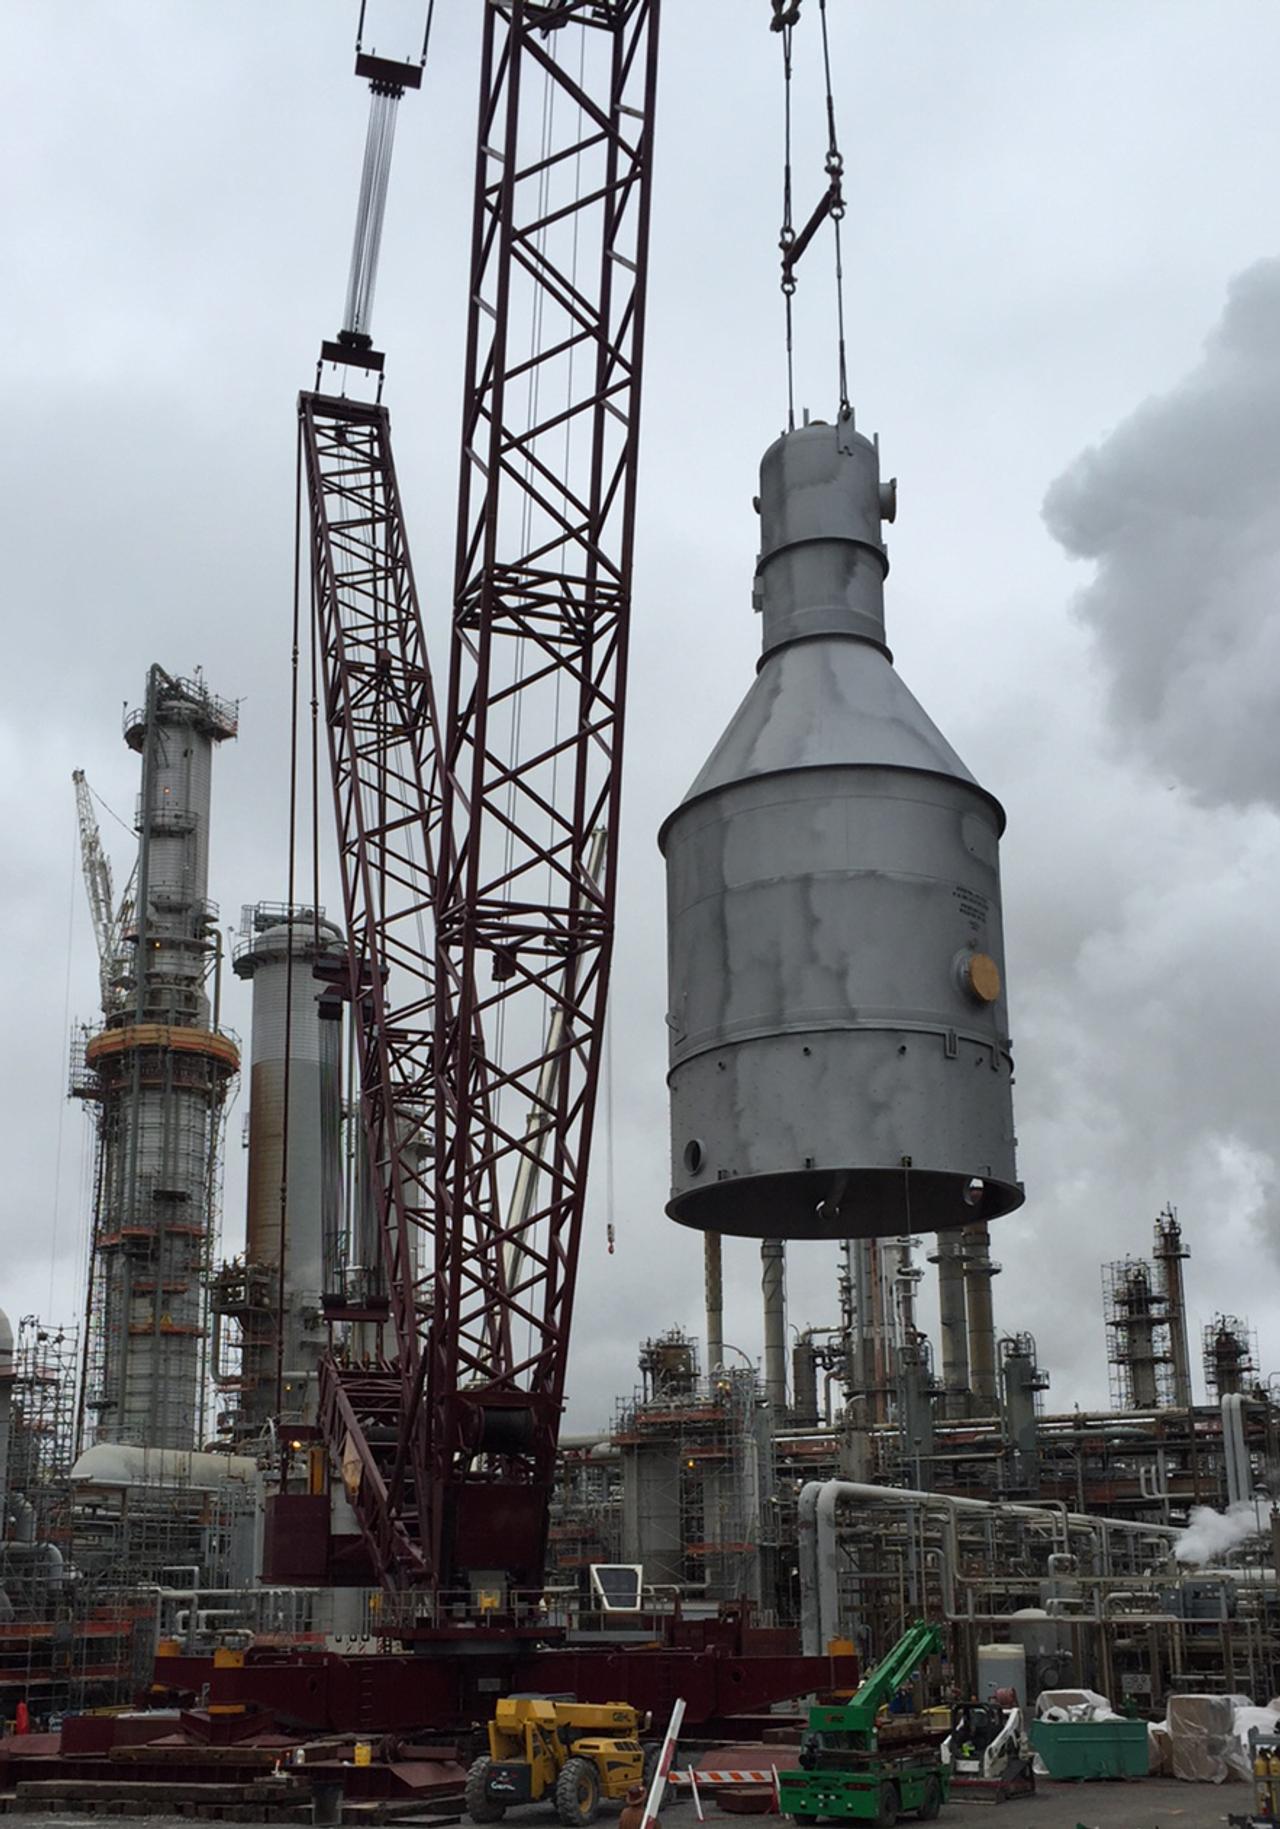 1800 Ton Crane for Heavy Lift Project